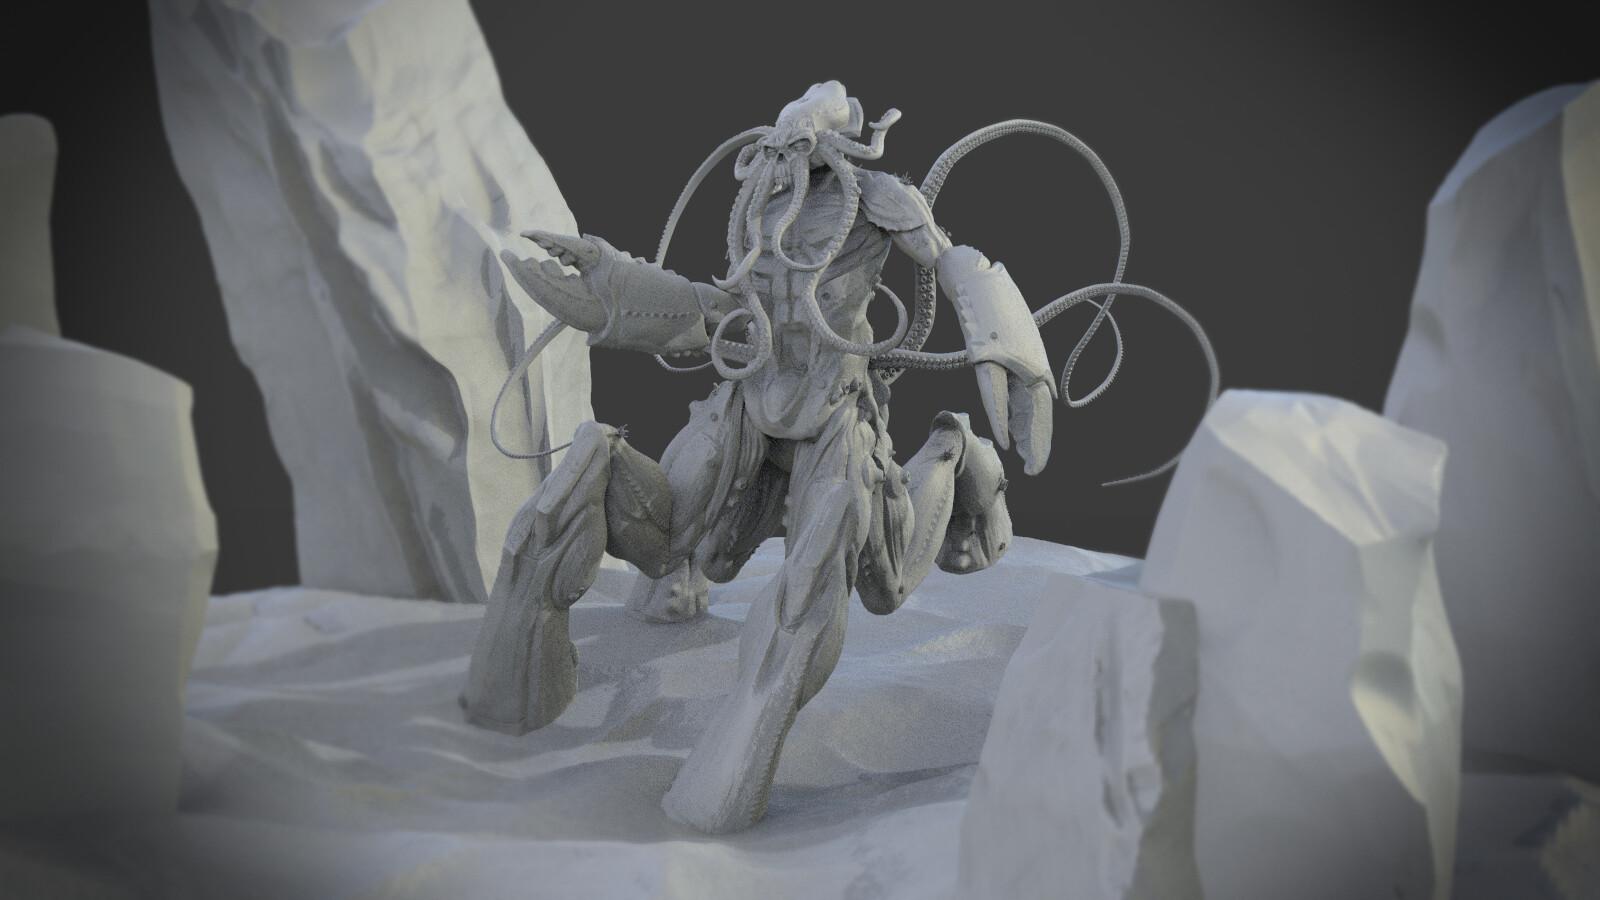 fito barraza art , Cthulhu,Kraken,Centaur